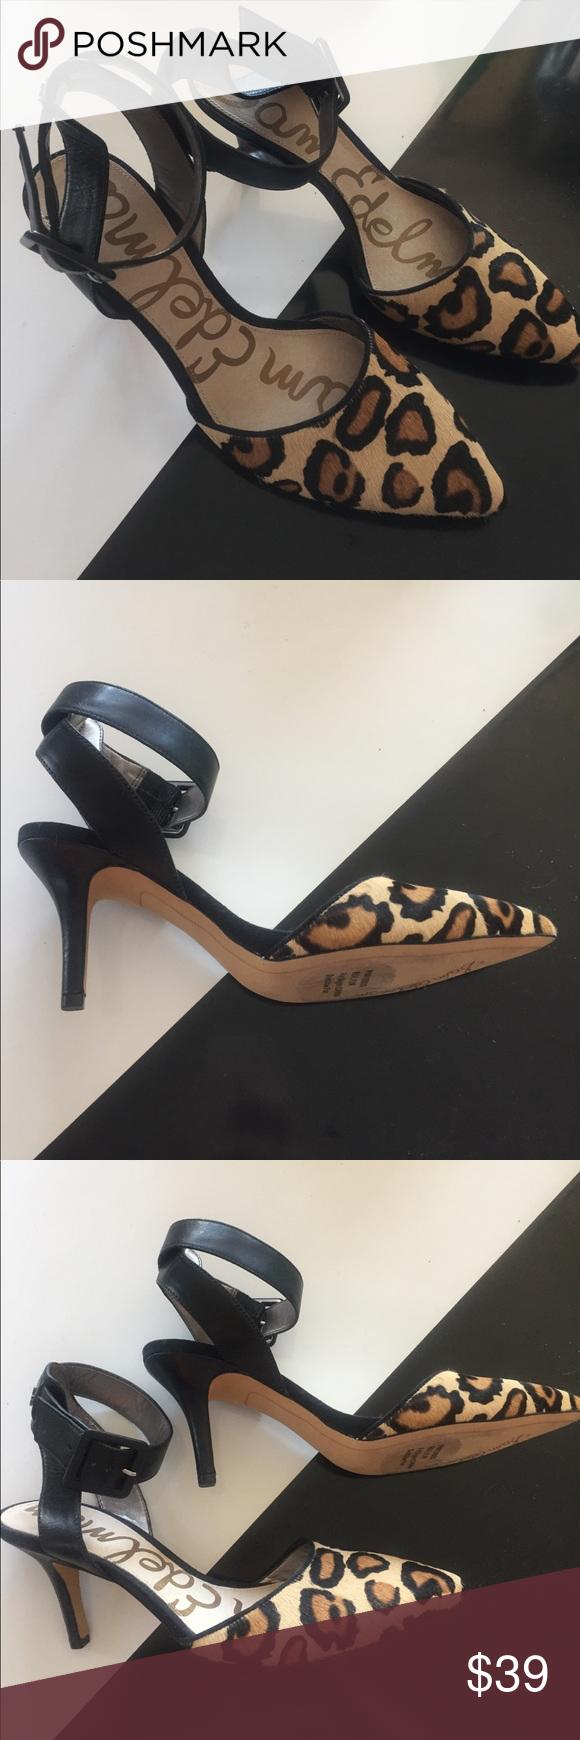 478c2256d46909 Sam Edelman NEW Okala Leopard Ankle Strap Heel - 8 SAM EDELMAN OKALA PUMP  HEEL IN